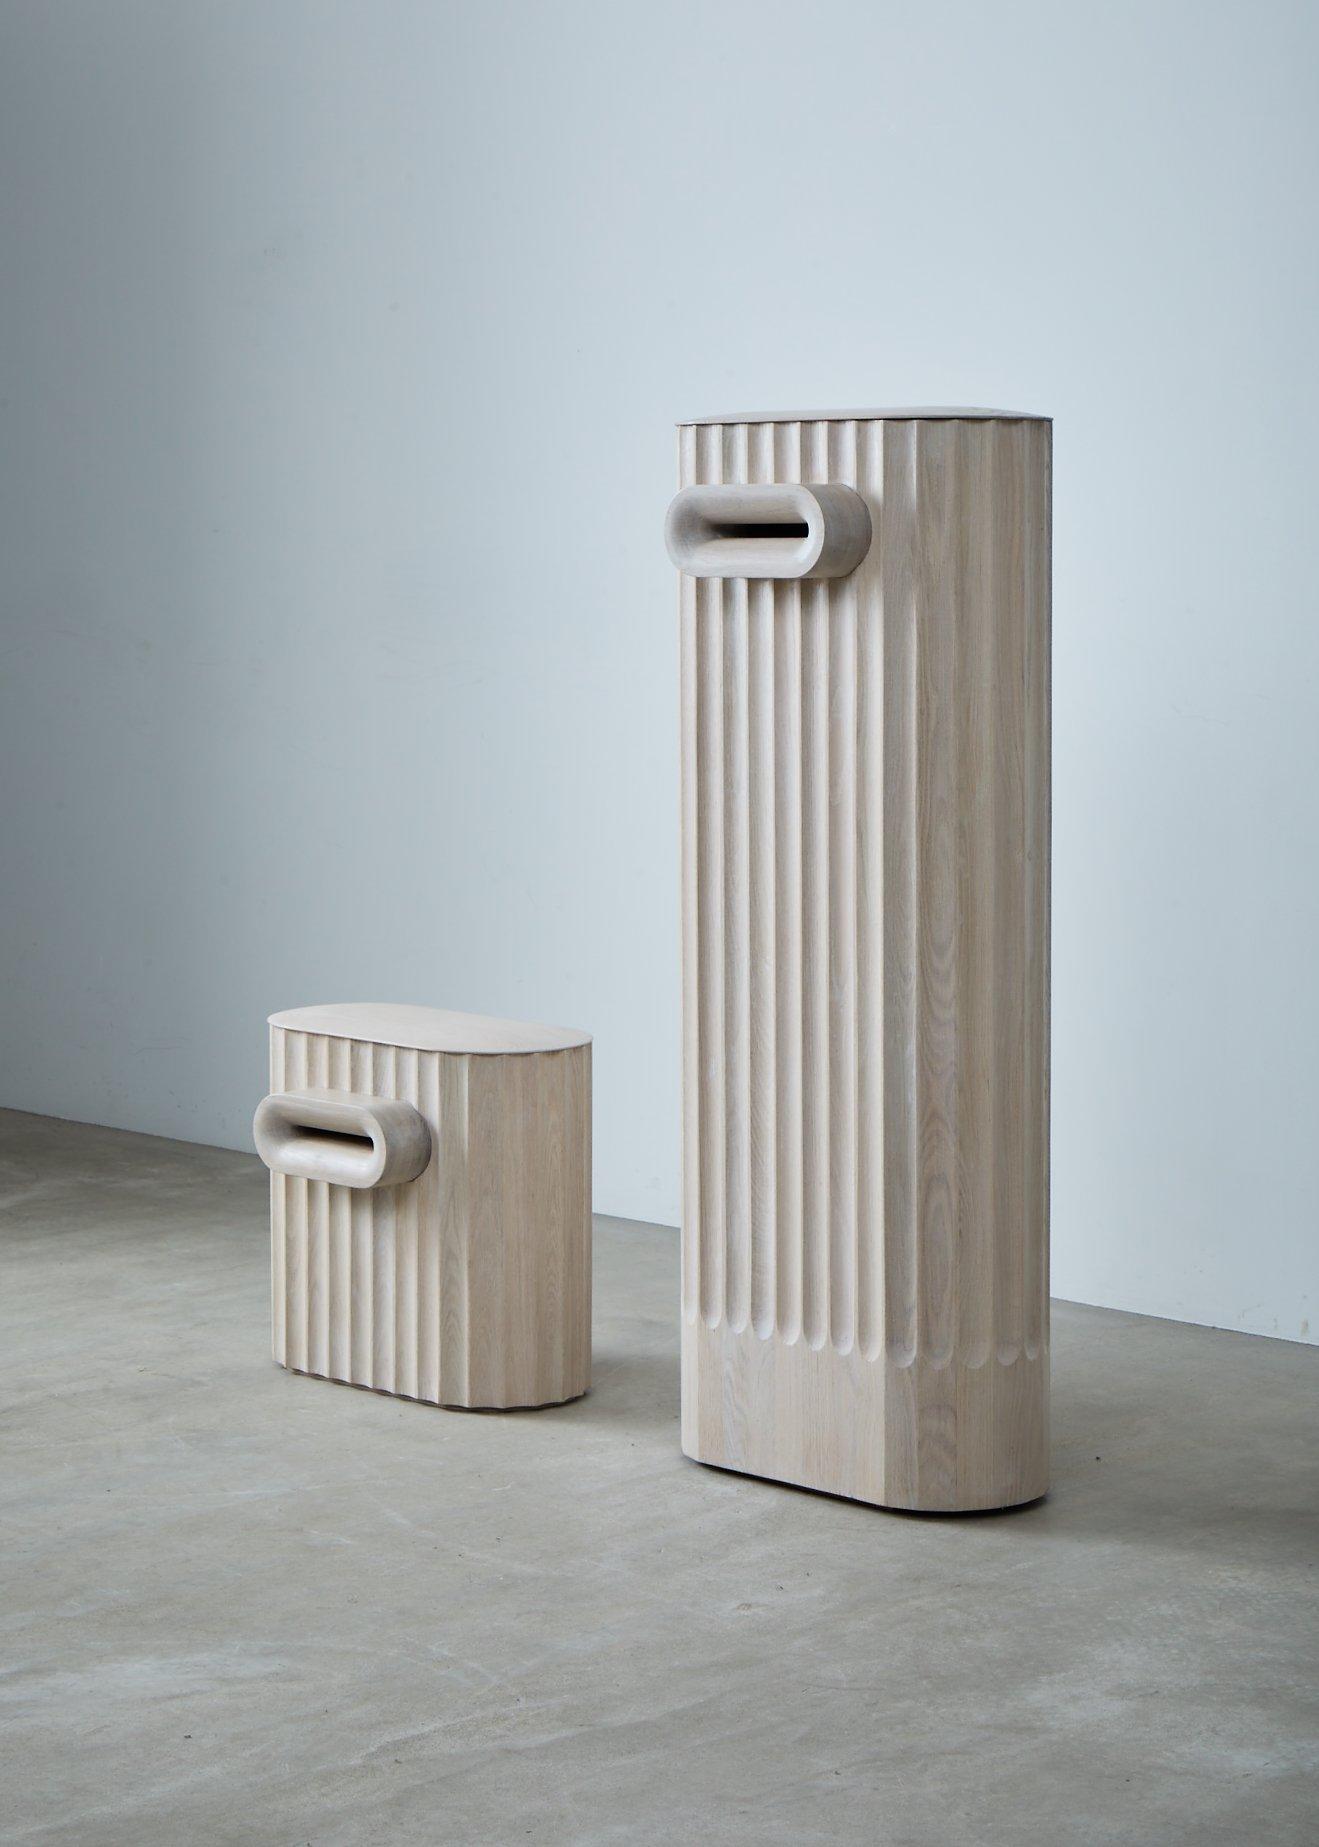 Serpentine Postbox. Studiomama, commissioned by da Hans Ulrich Obrist © Petr Krejci